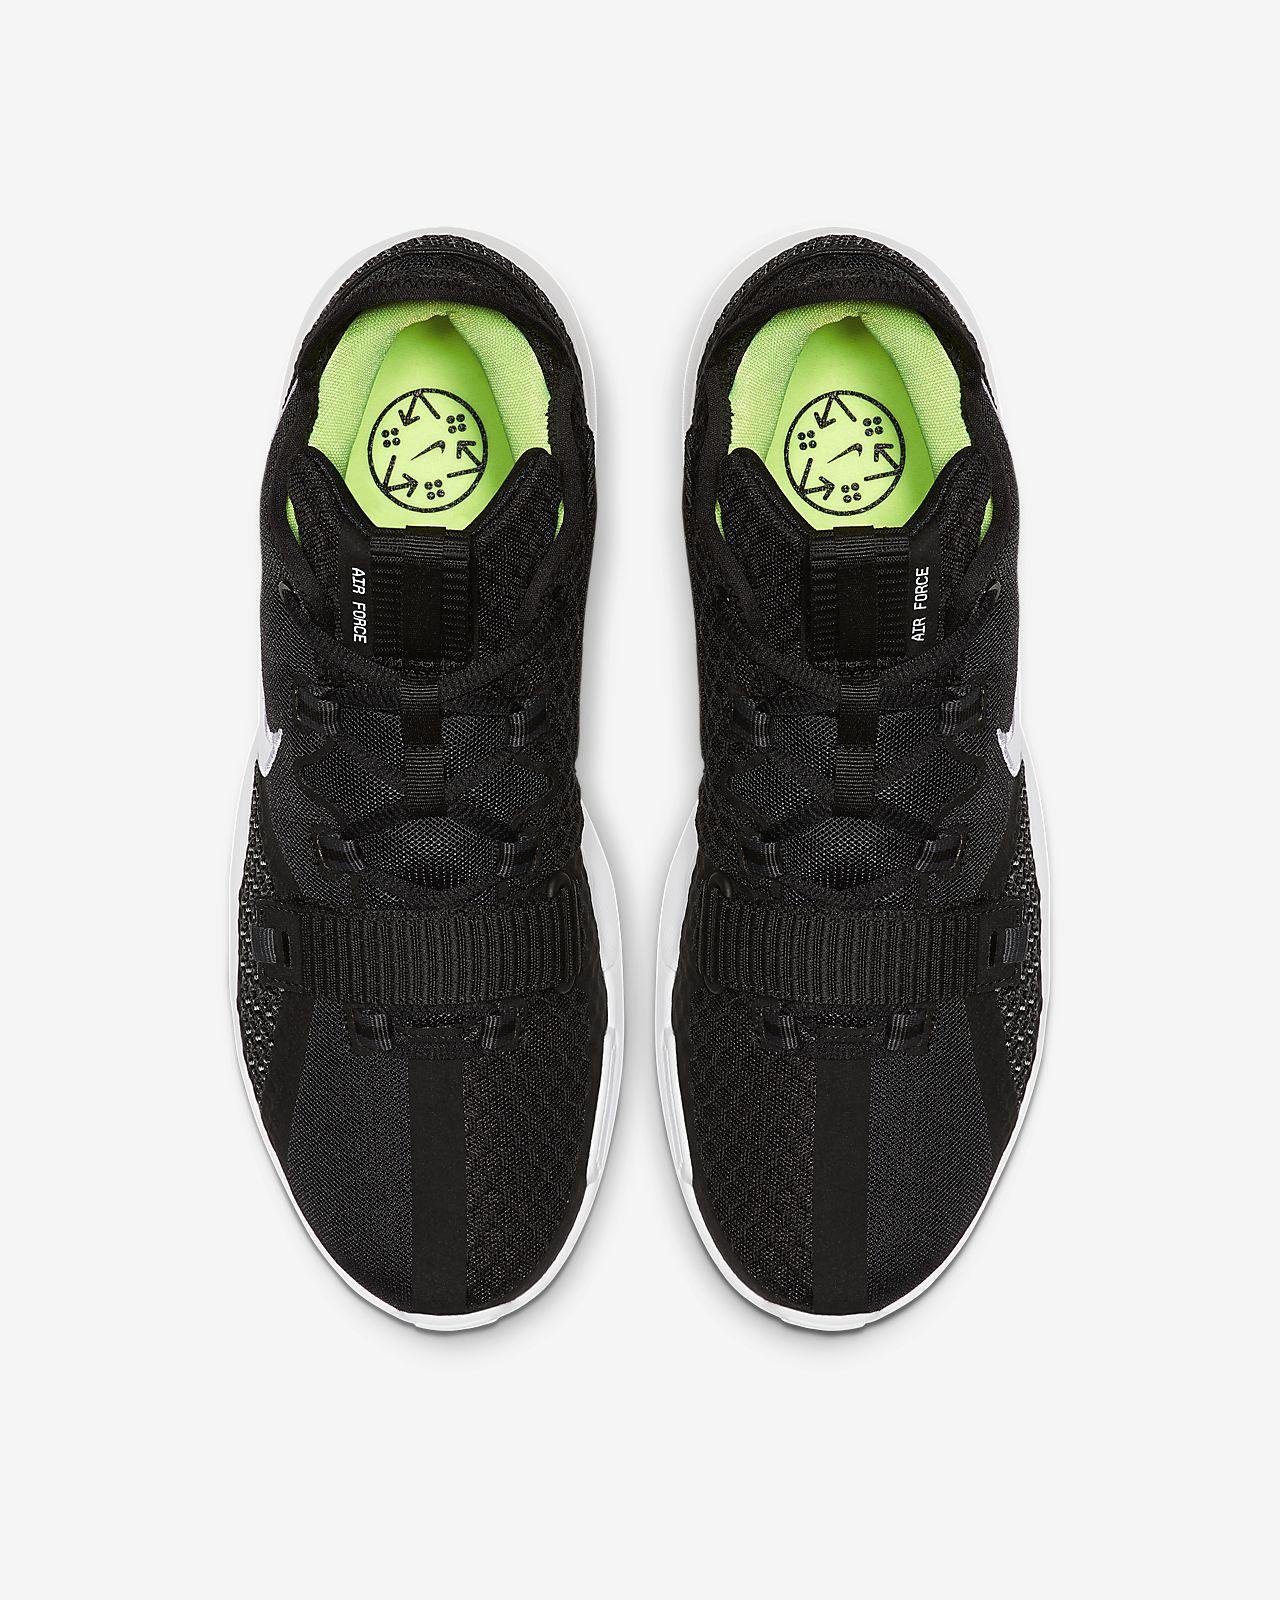 Calzado de básquetbol Nike Air Force Max Low.